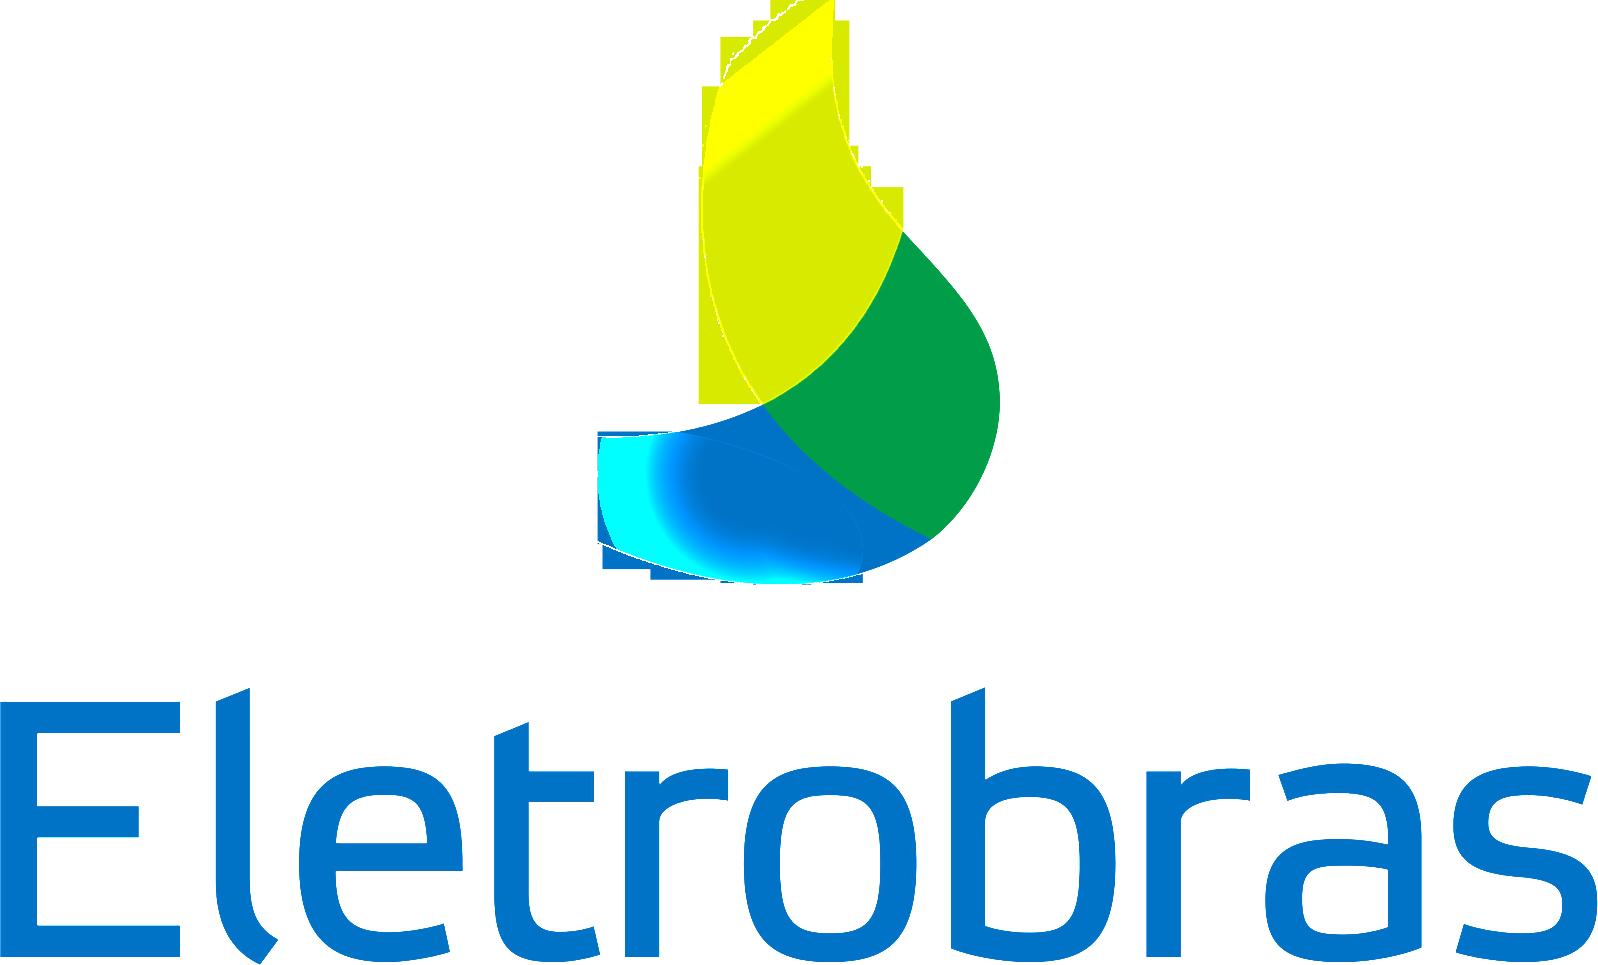 Eletrobras Logo, Logotipo.